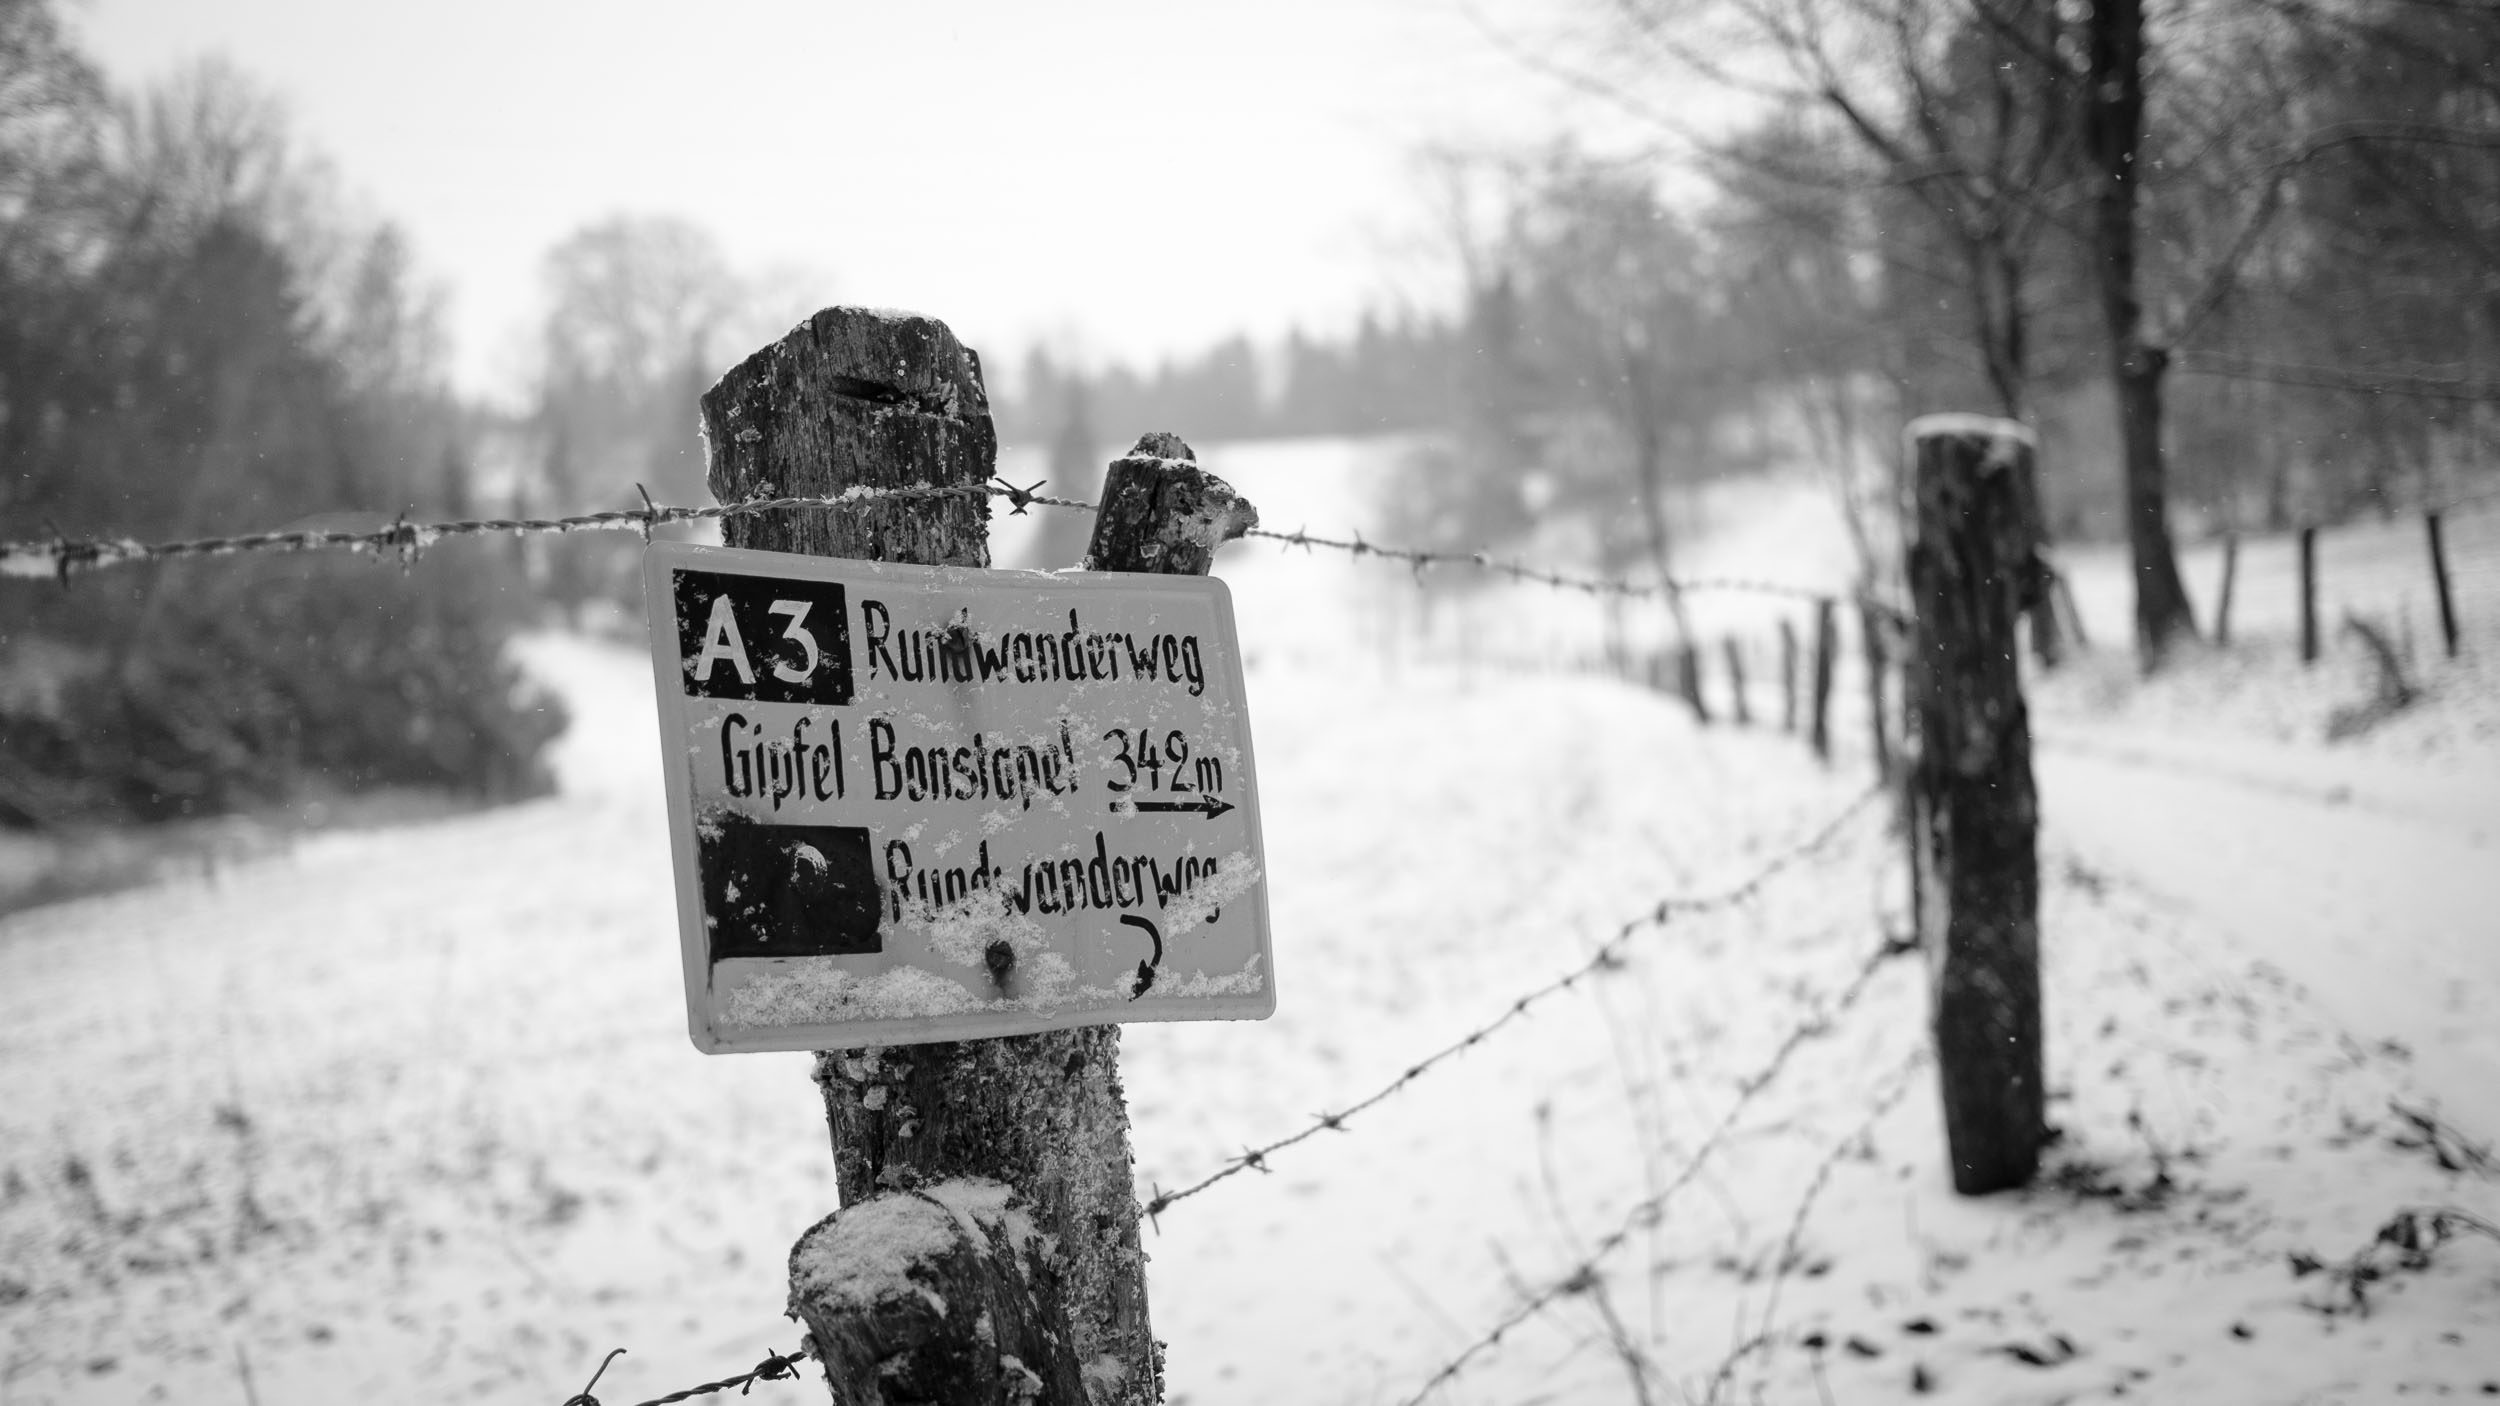 Bonstapel im Schnee